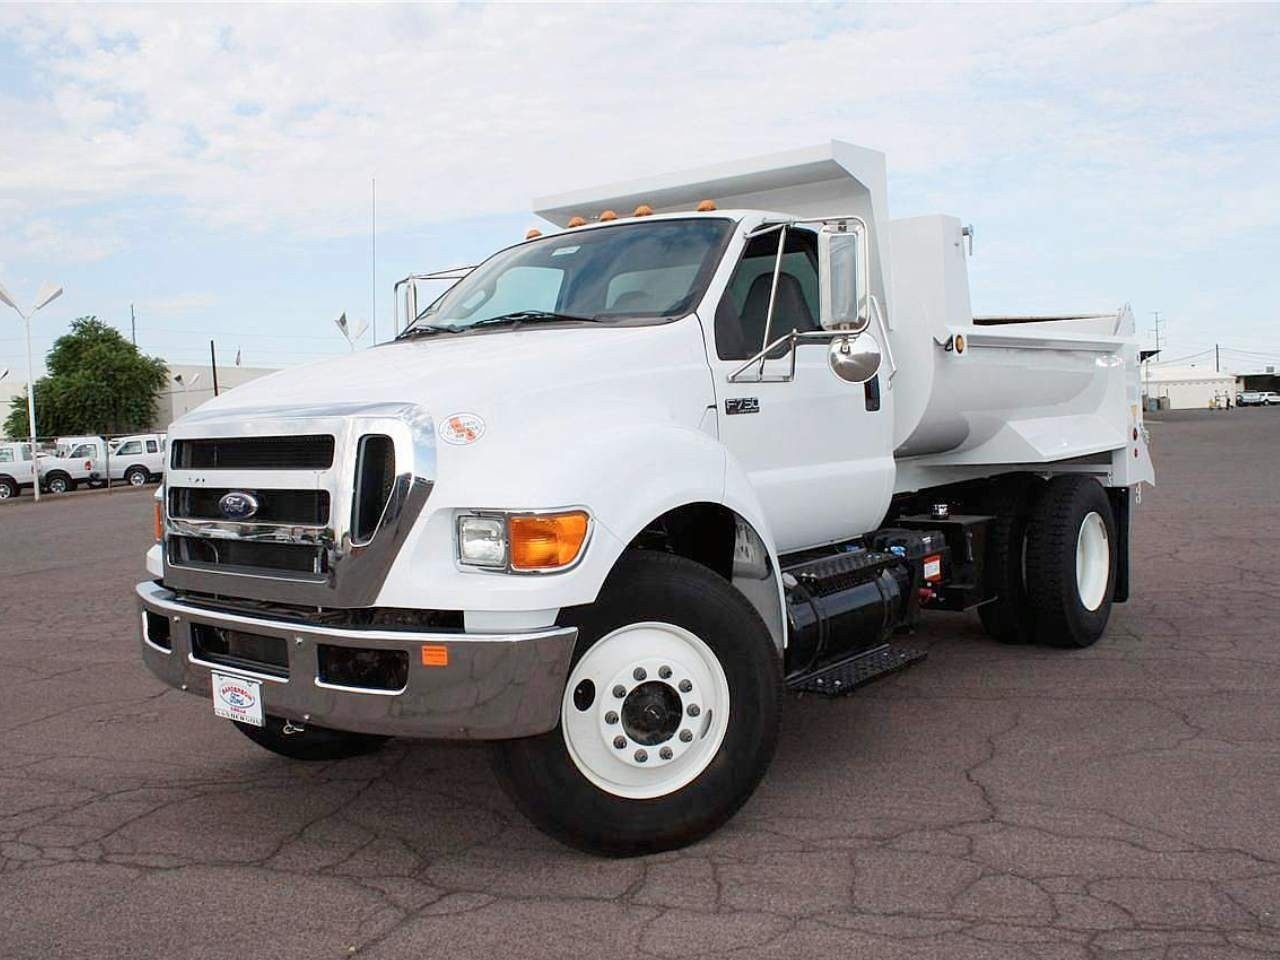 42 объявления - Продажа грузовиков Ford (Форд), купить ...